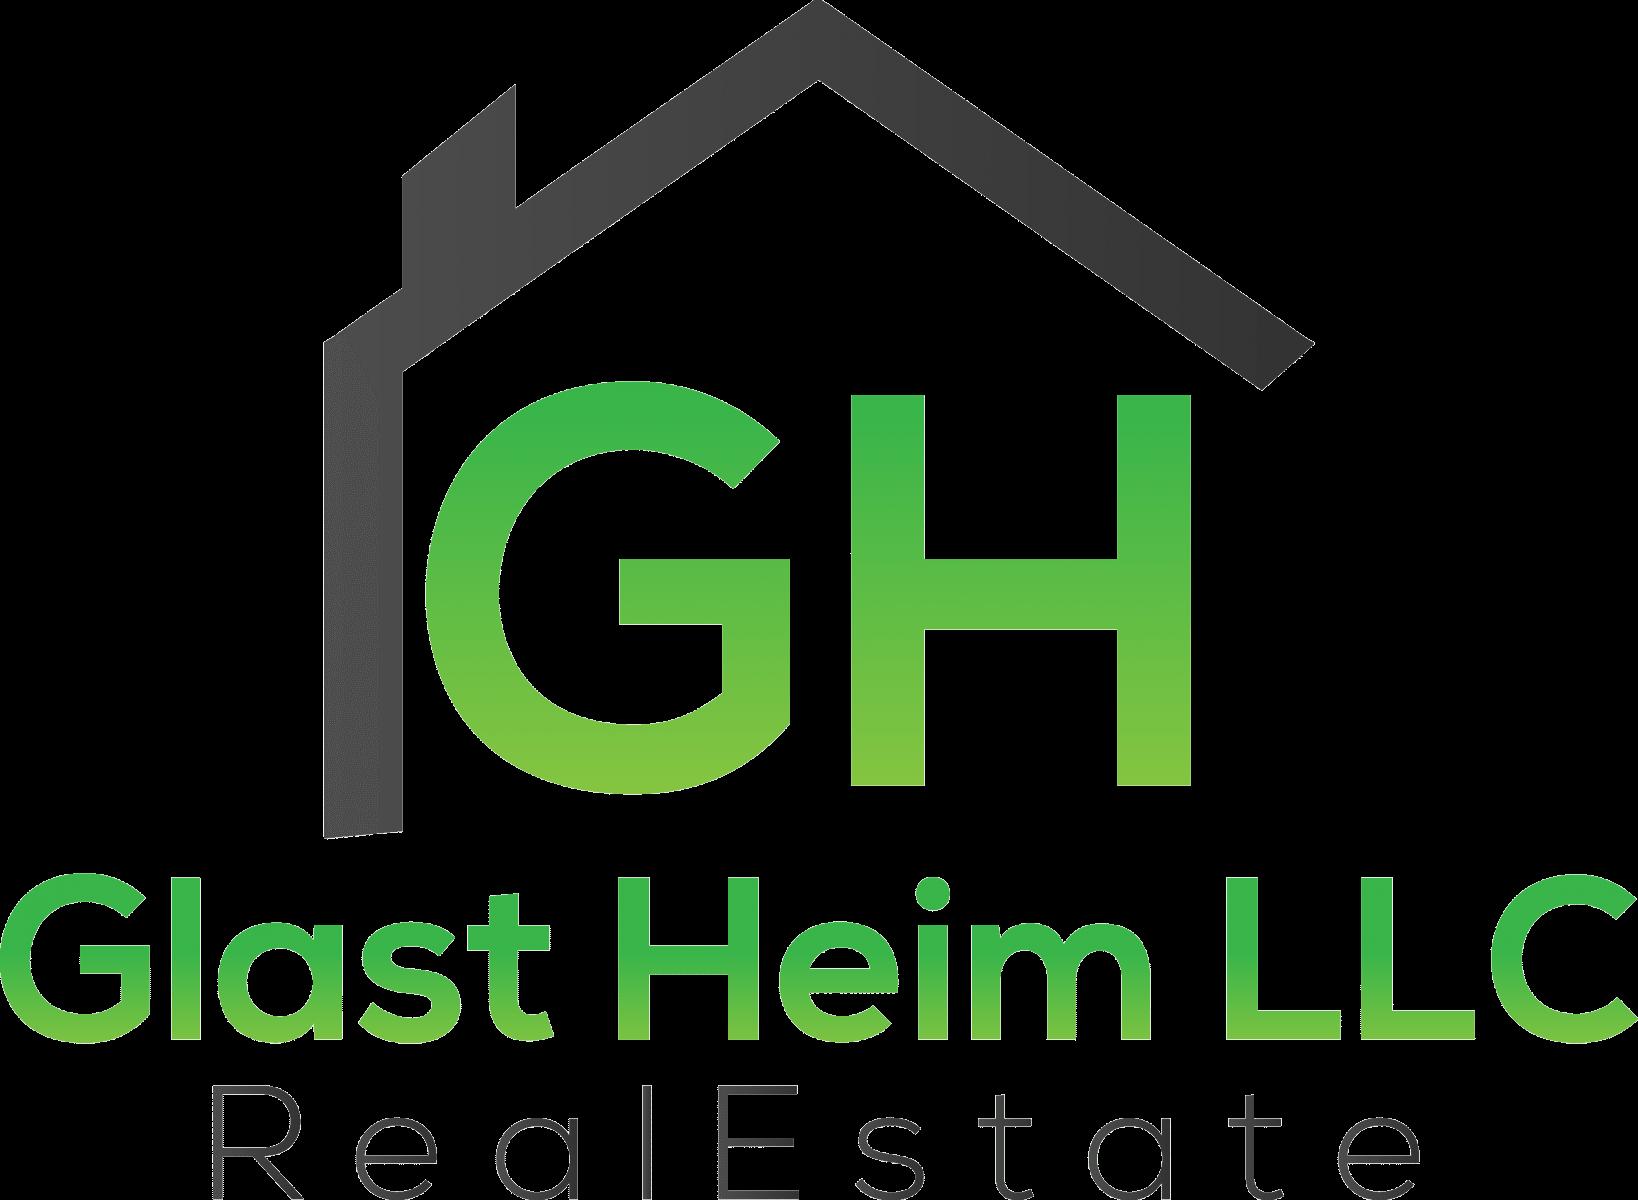 Glast Heim LLC logo